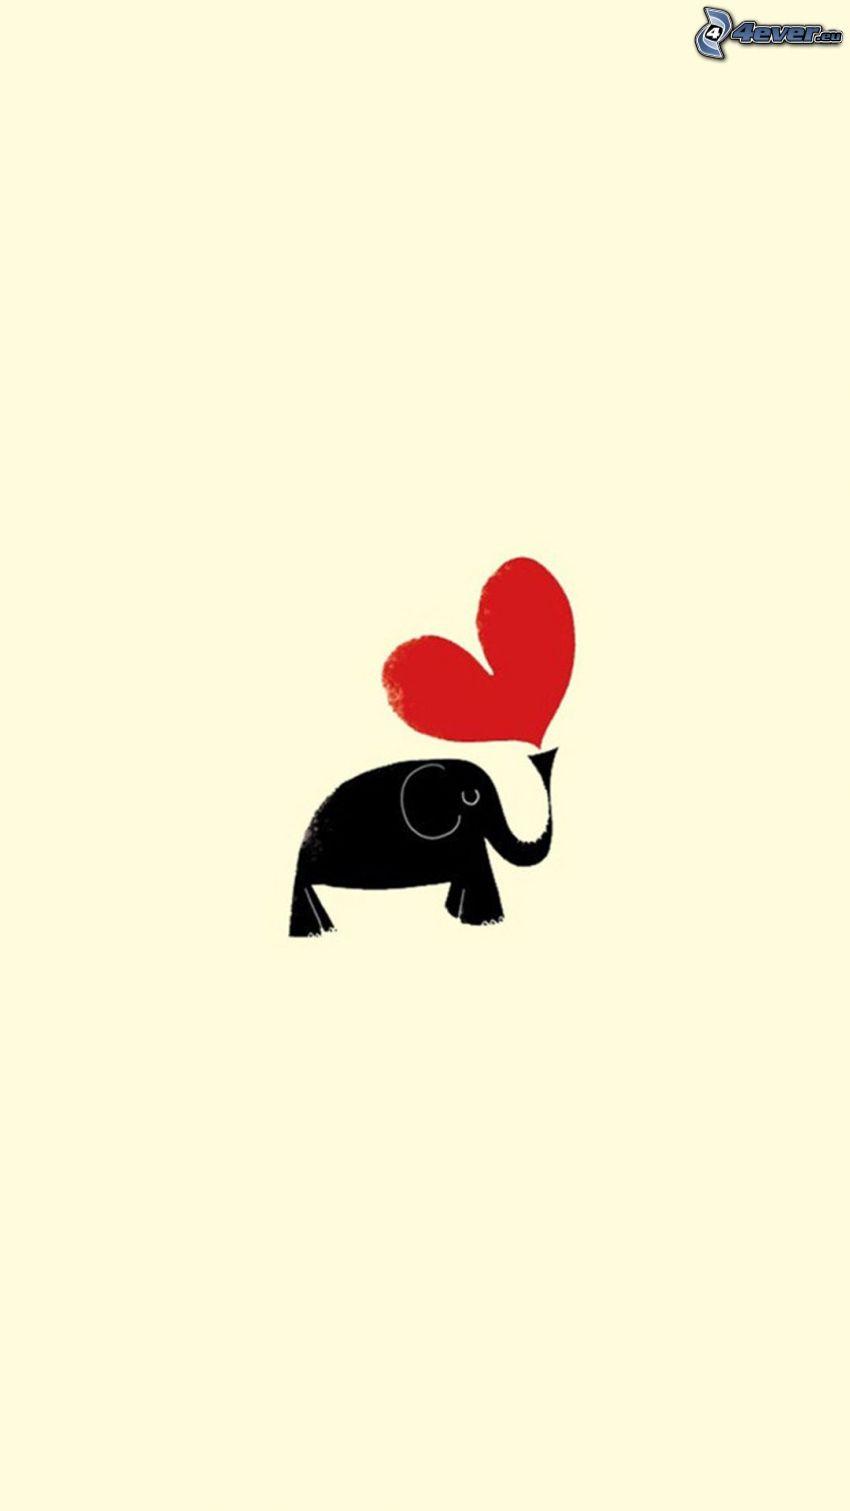 éléphant, cœur